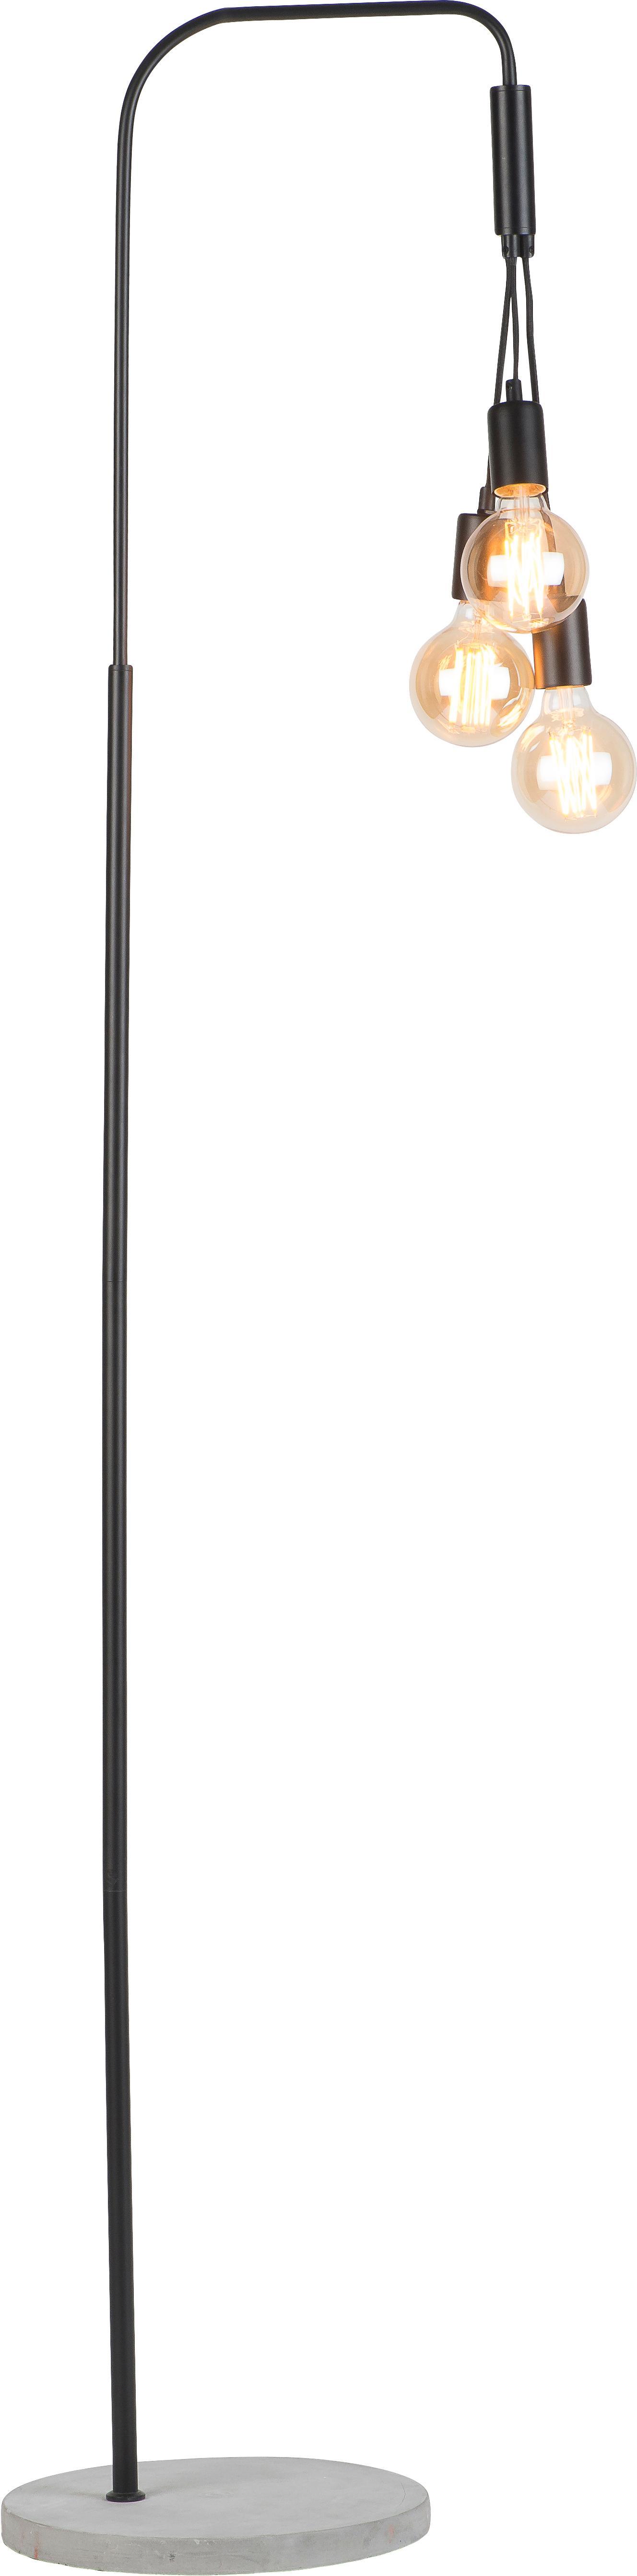 Design vloerlamp Oslo, Lampvoet: cement, Zwart, 48 x 190 cm